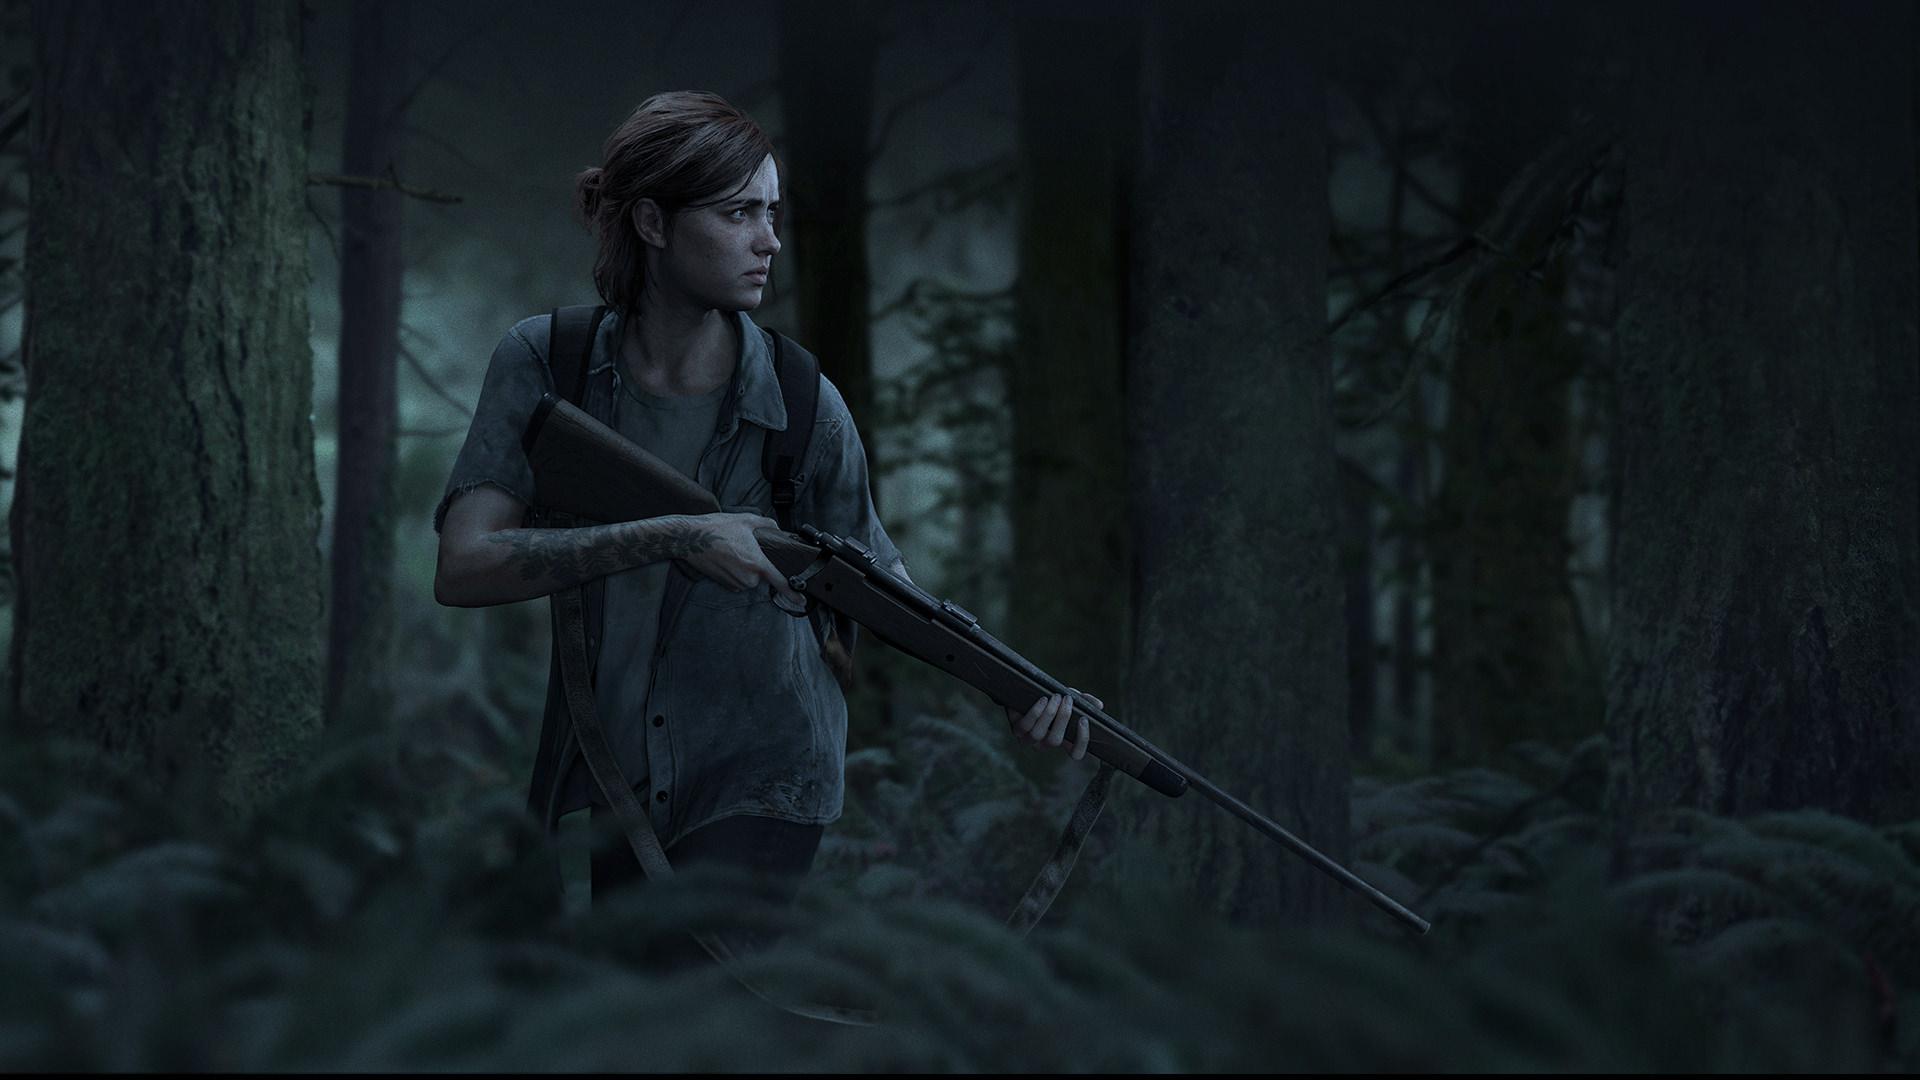 download The Last of Us Part 2 Ellie Wallpaper Dark Tint 1920x1080